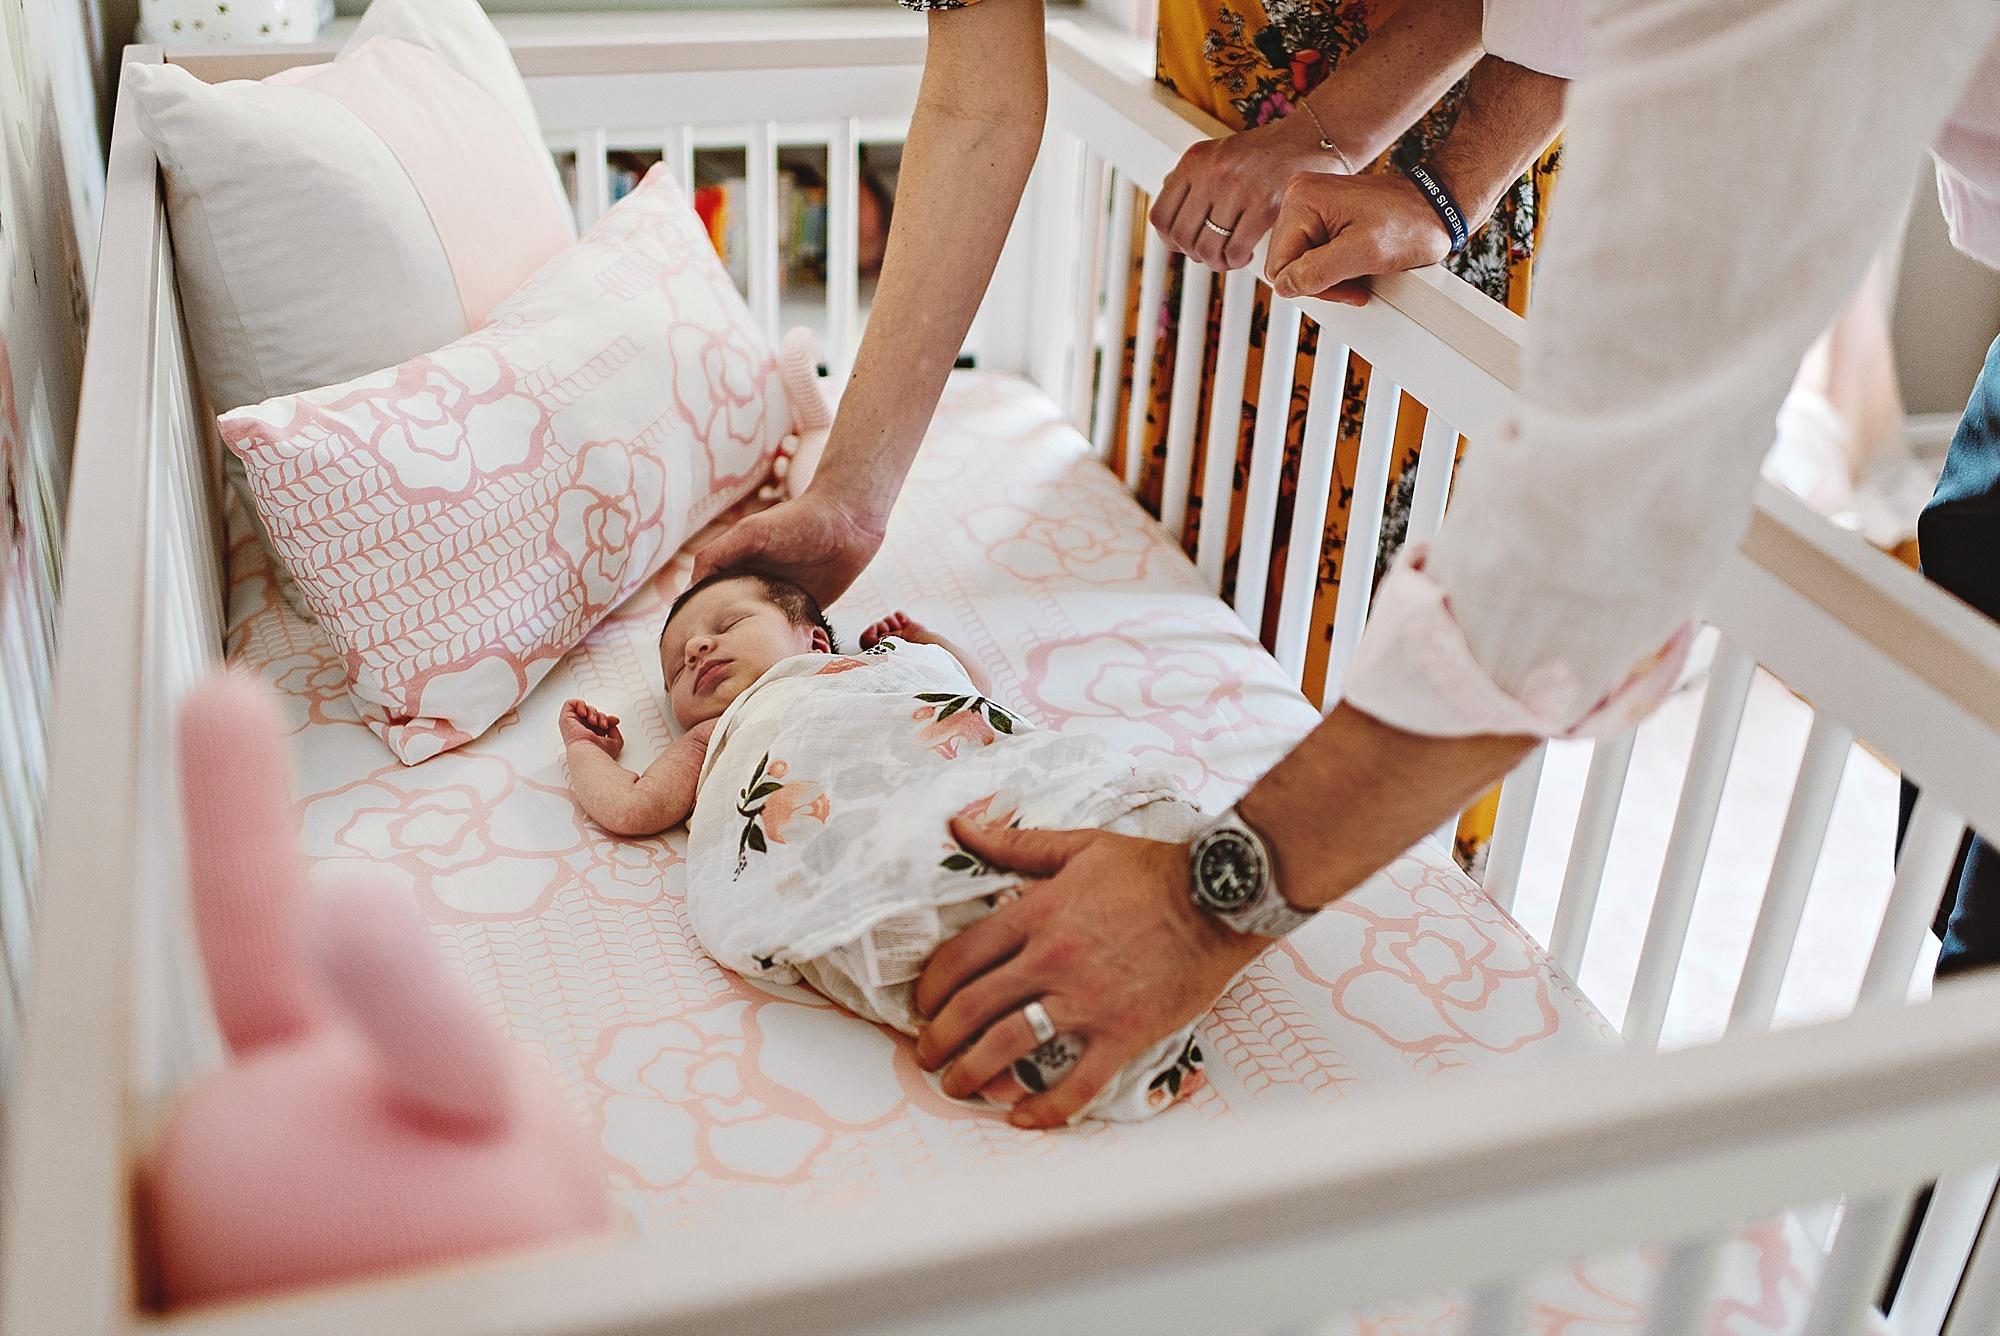 lauren-grayson-photography-cleveland-ohio-photographer-newborn-session-in-home-lifestyle-newborn-family-vivian_0656.jpg